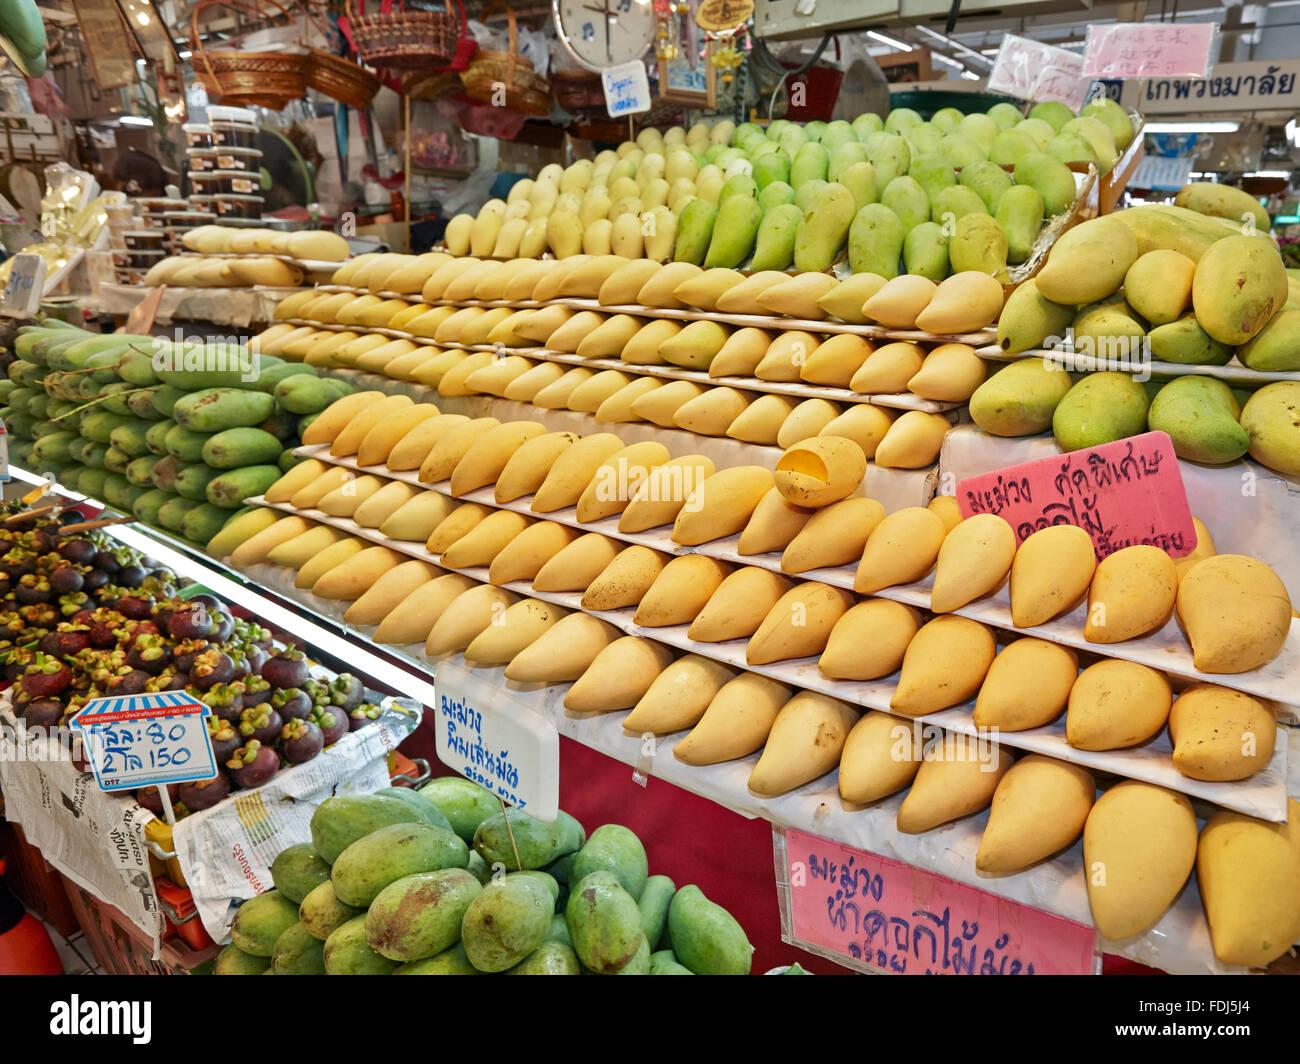 Fruit stall at Or Tor Kor (OTK) Fresh Market. Bangkok, Thailand. - Stock Image